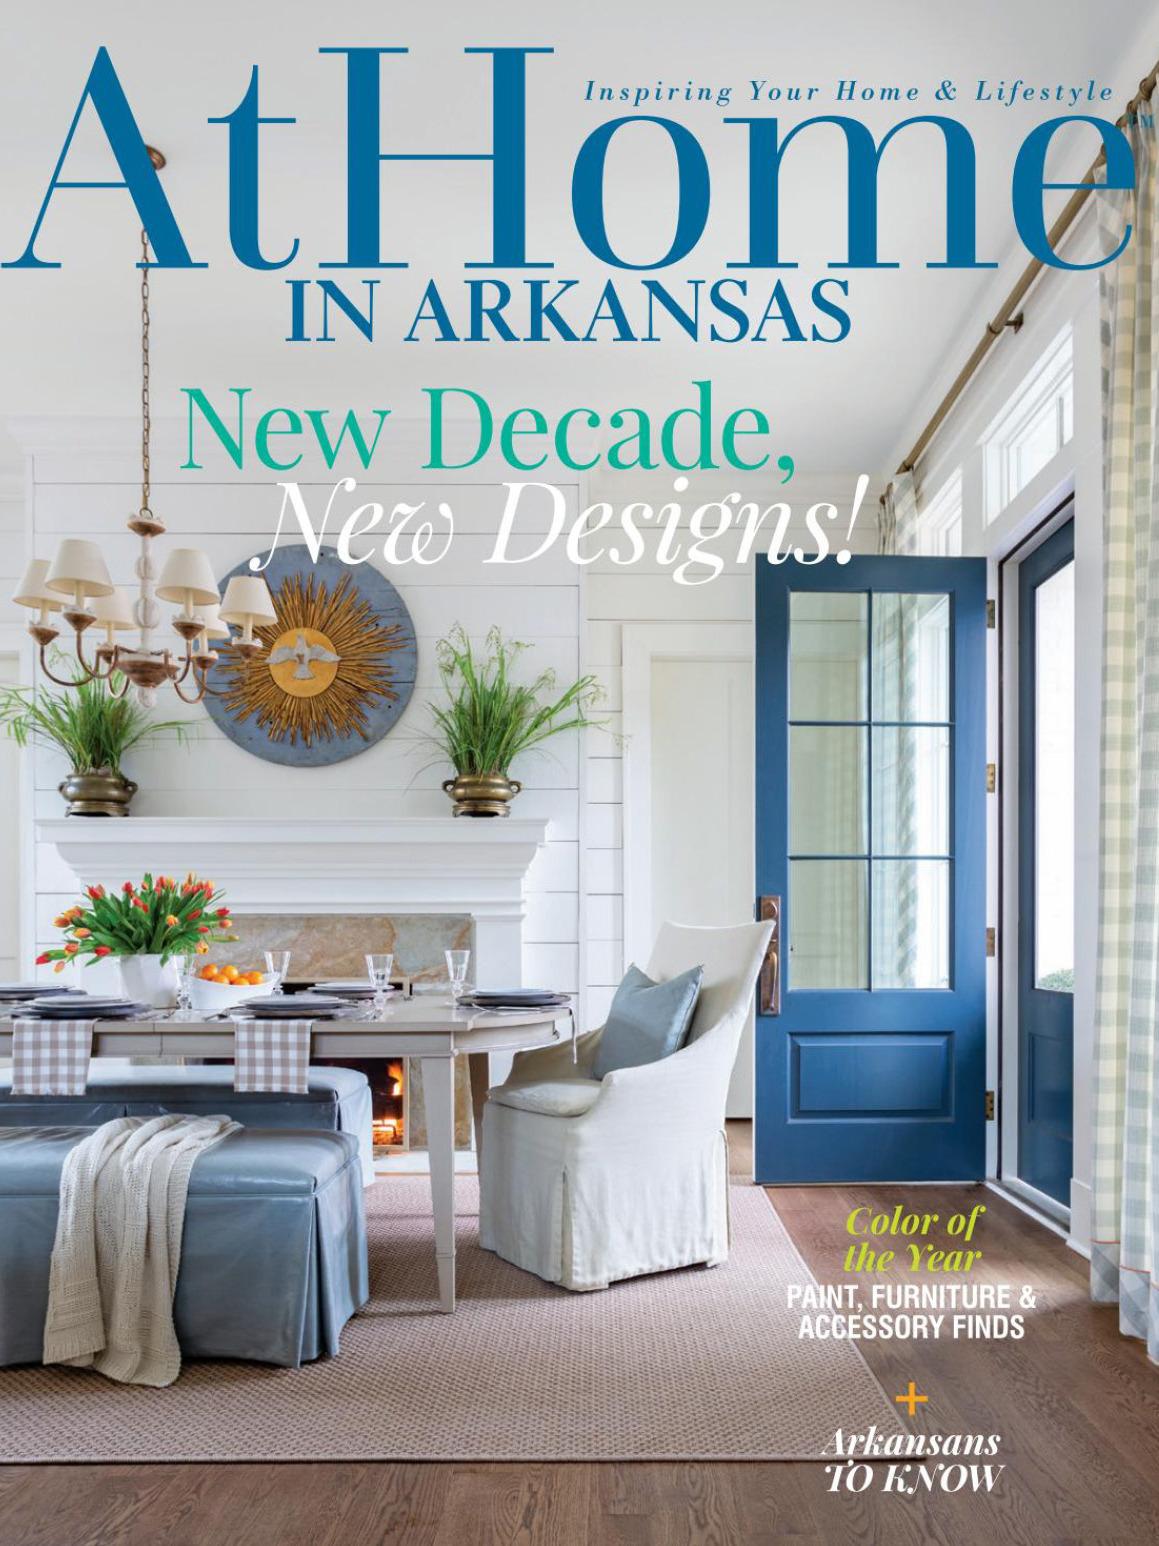 《At Home In Arkansas》美国室内时尚杂志2020年01月-2020年02月号